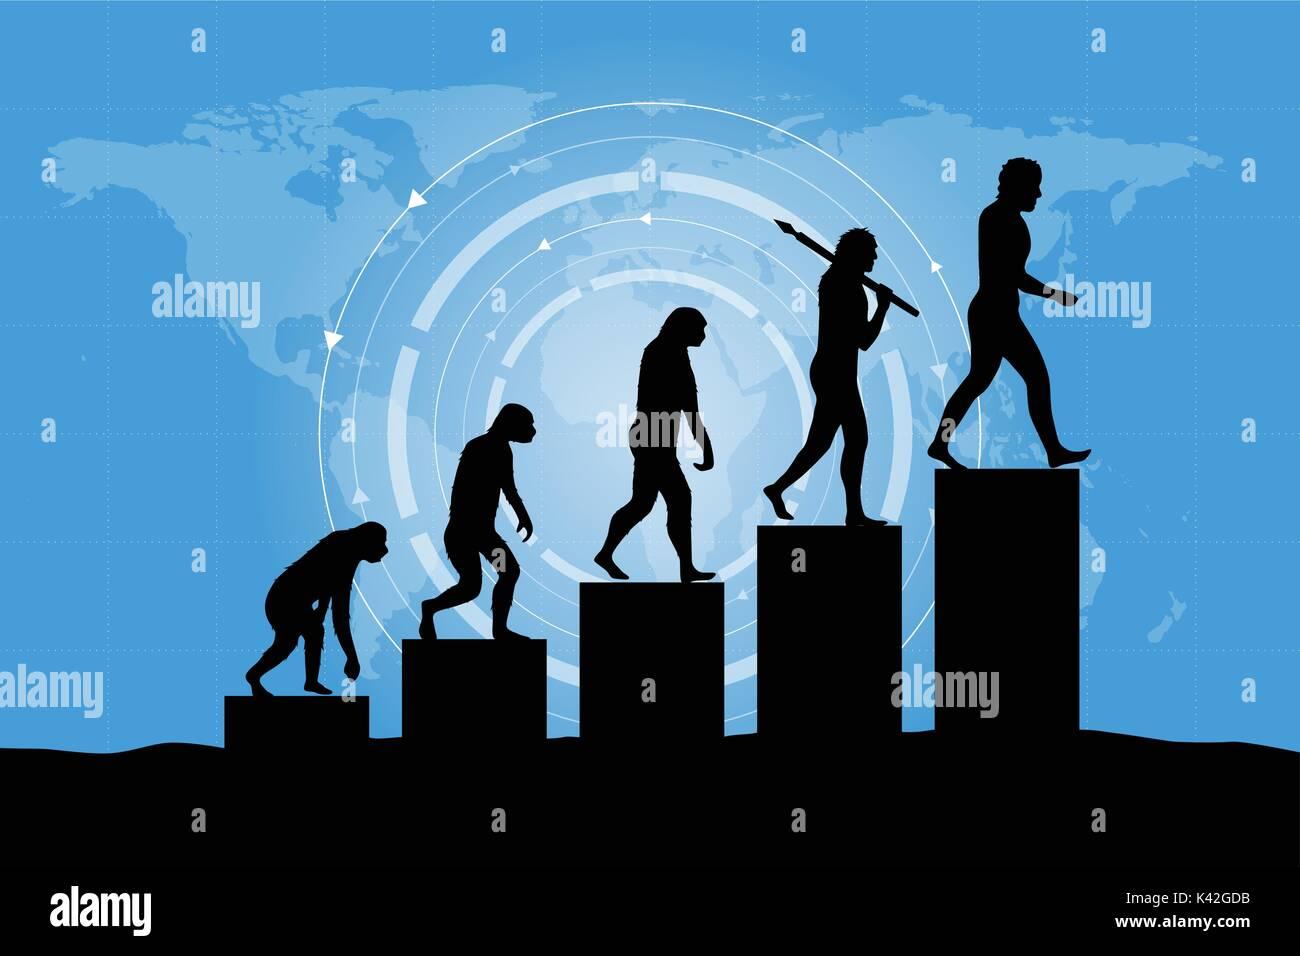 Human evolution into the present digital world. Business risk concept! - Stock Image